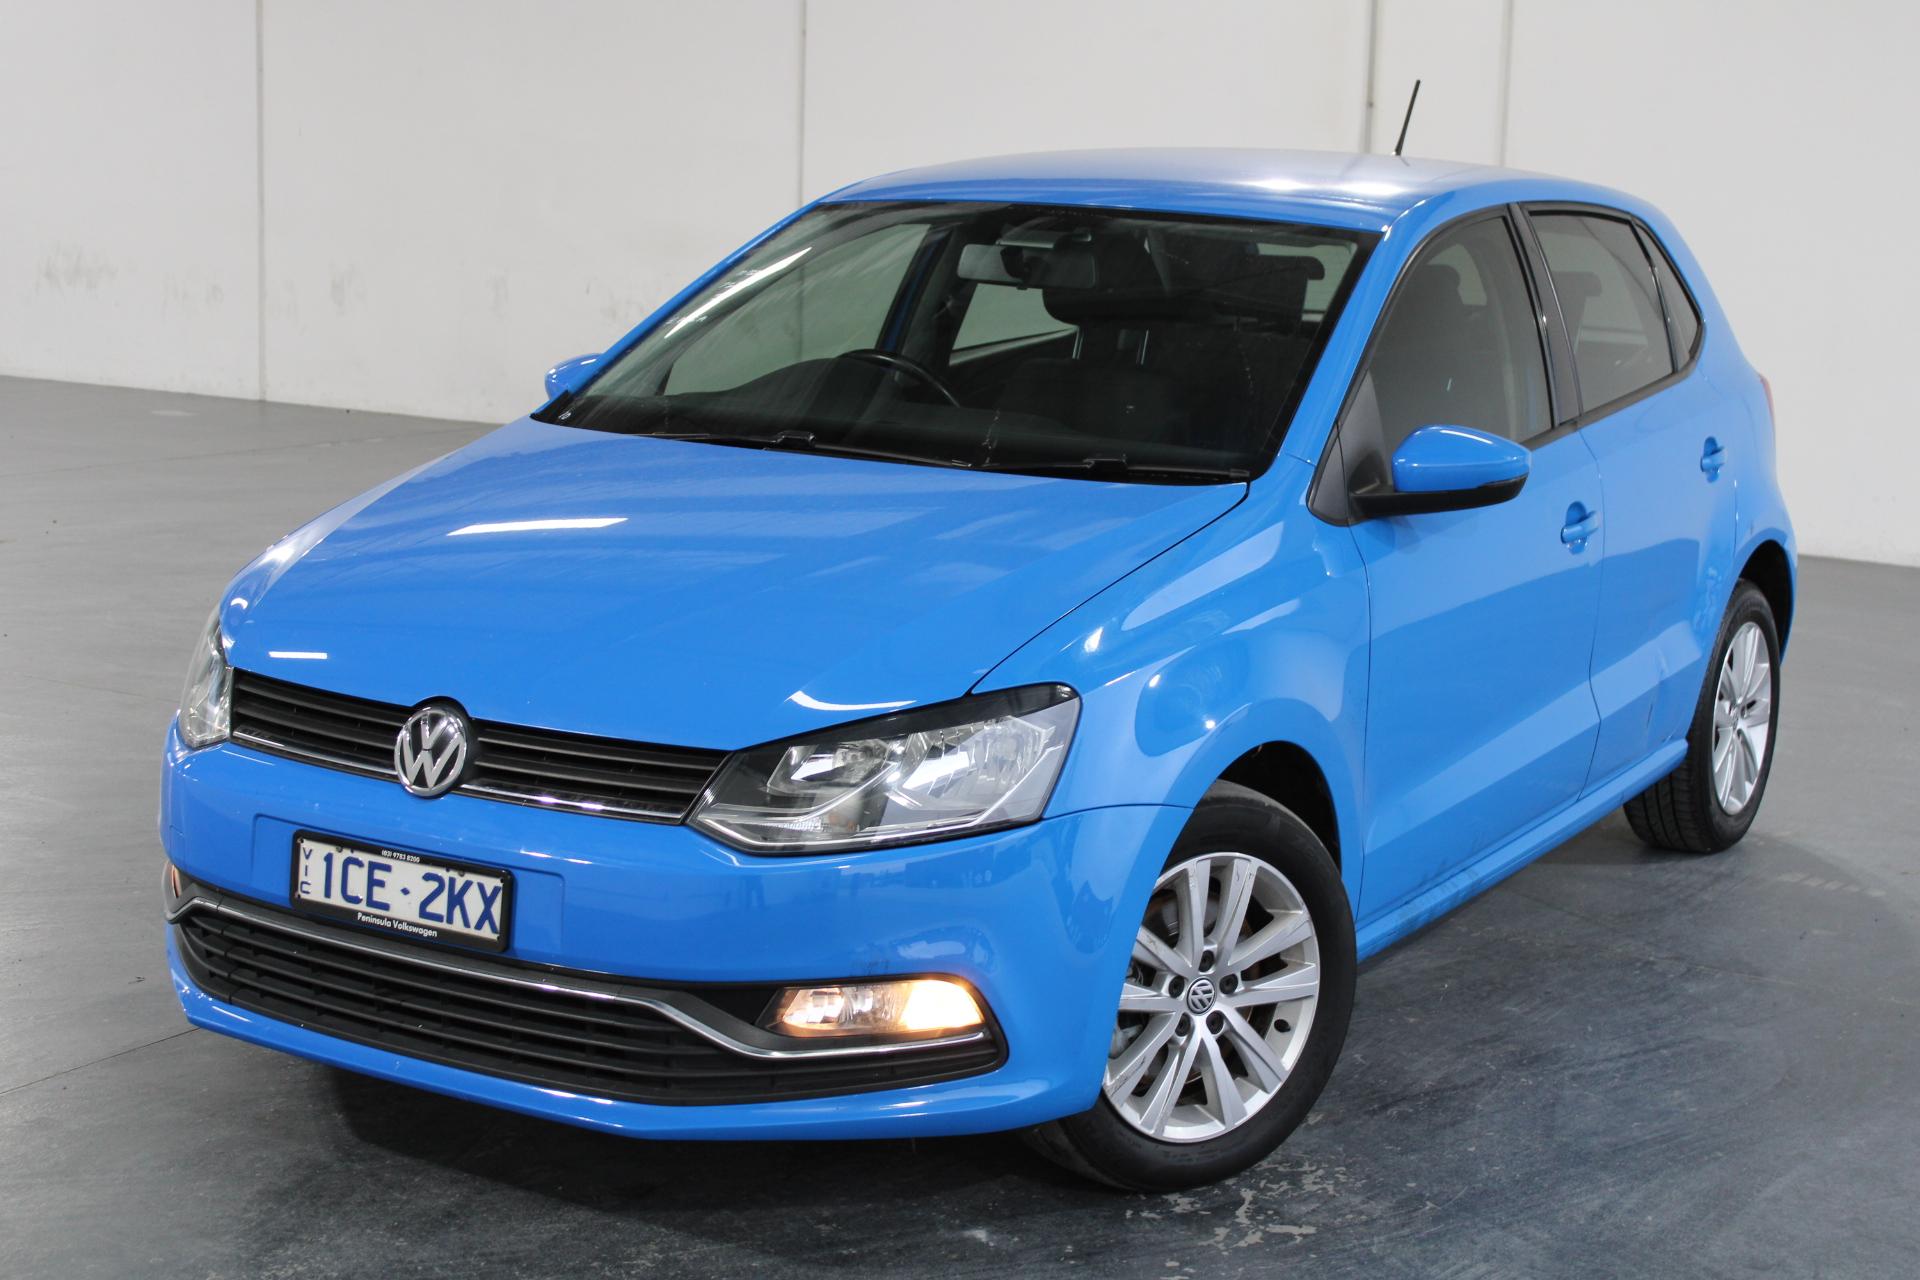 2014 Volkswagen Polo 81TSI COMFORTLINE 6R Automatic Hatchback